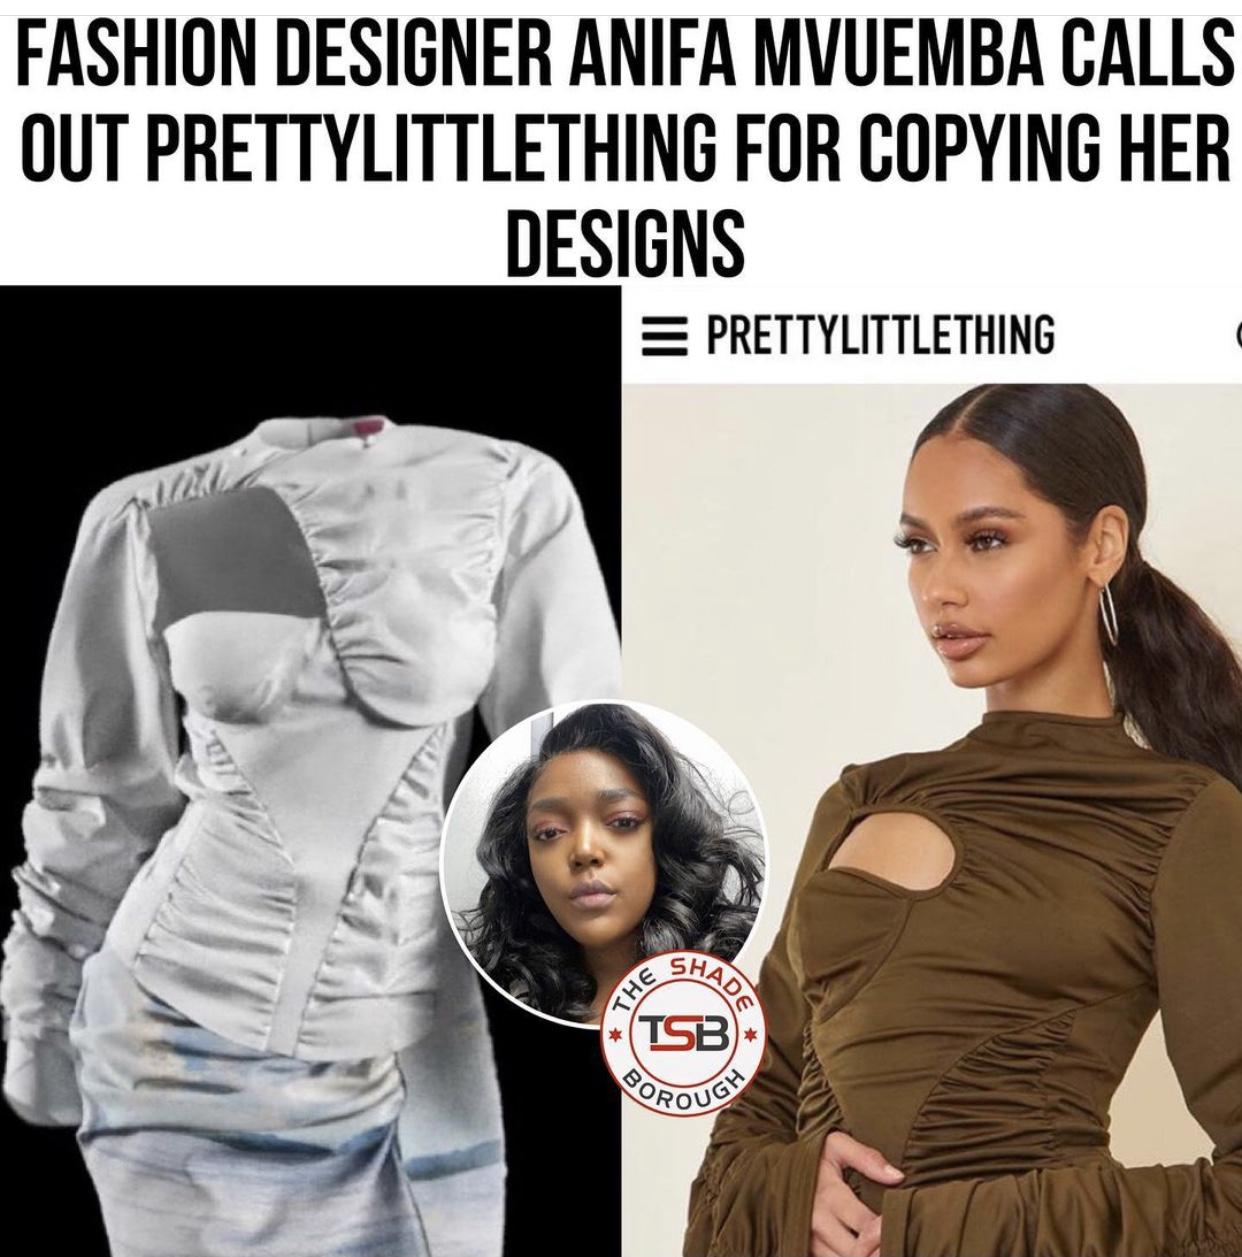 Independent designer vs fast fashion brand PLT, image from public instagram.